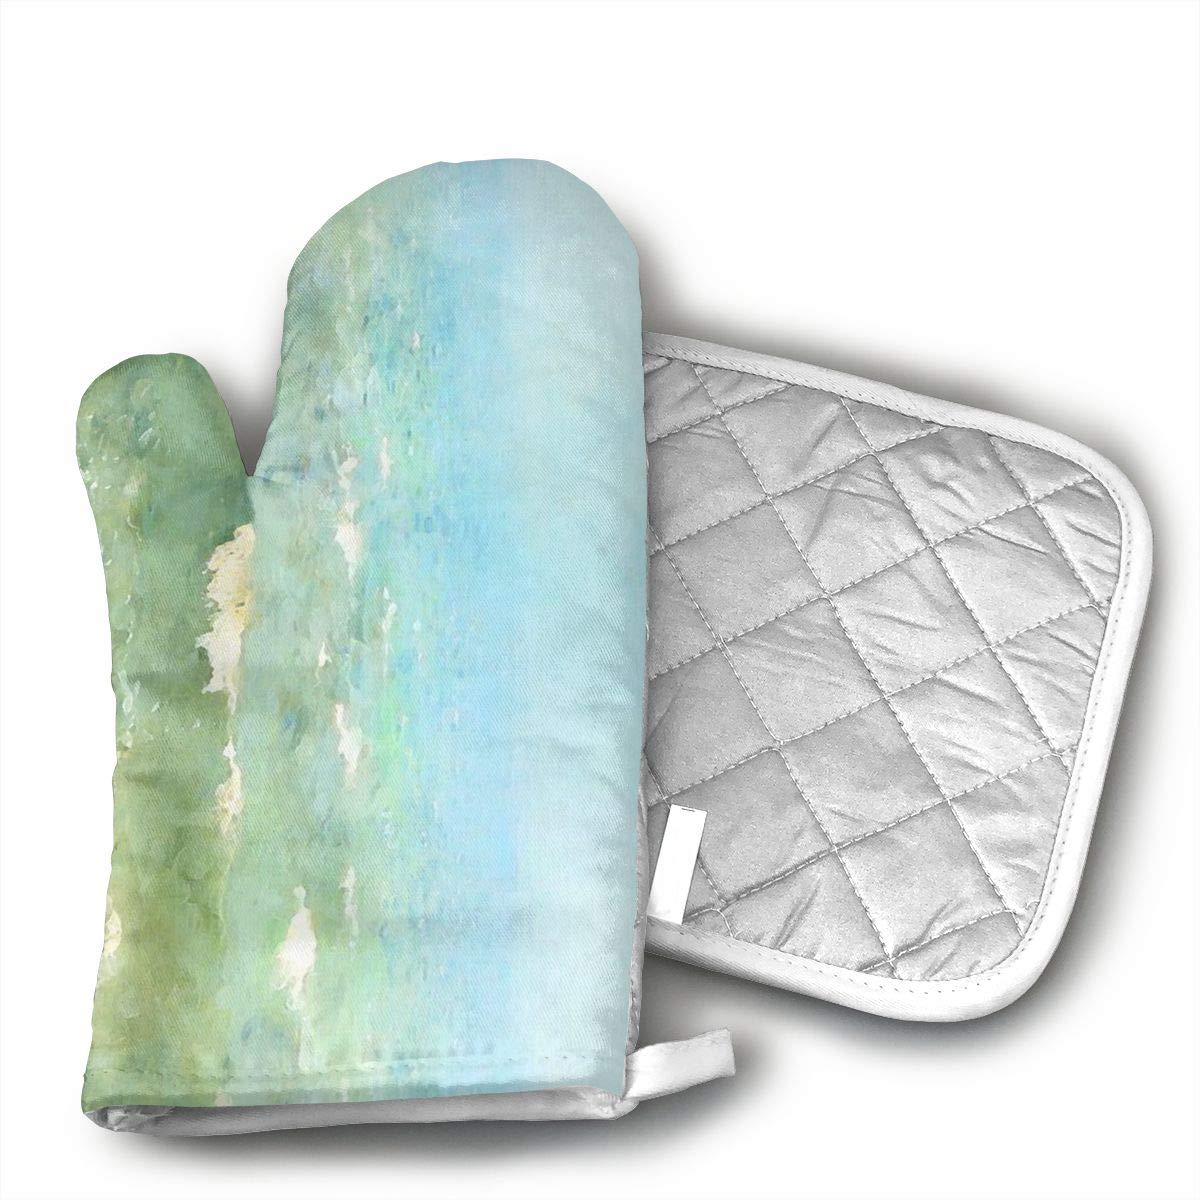 QEDGC Serene Coastal Border Oven Hot Mitts Professional Heat Resistant Pot Holder & Baking Gloves